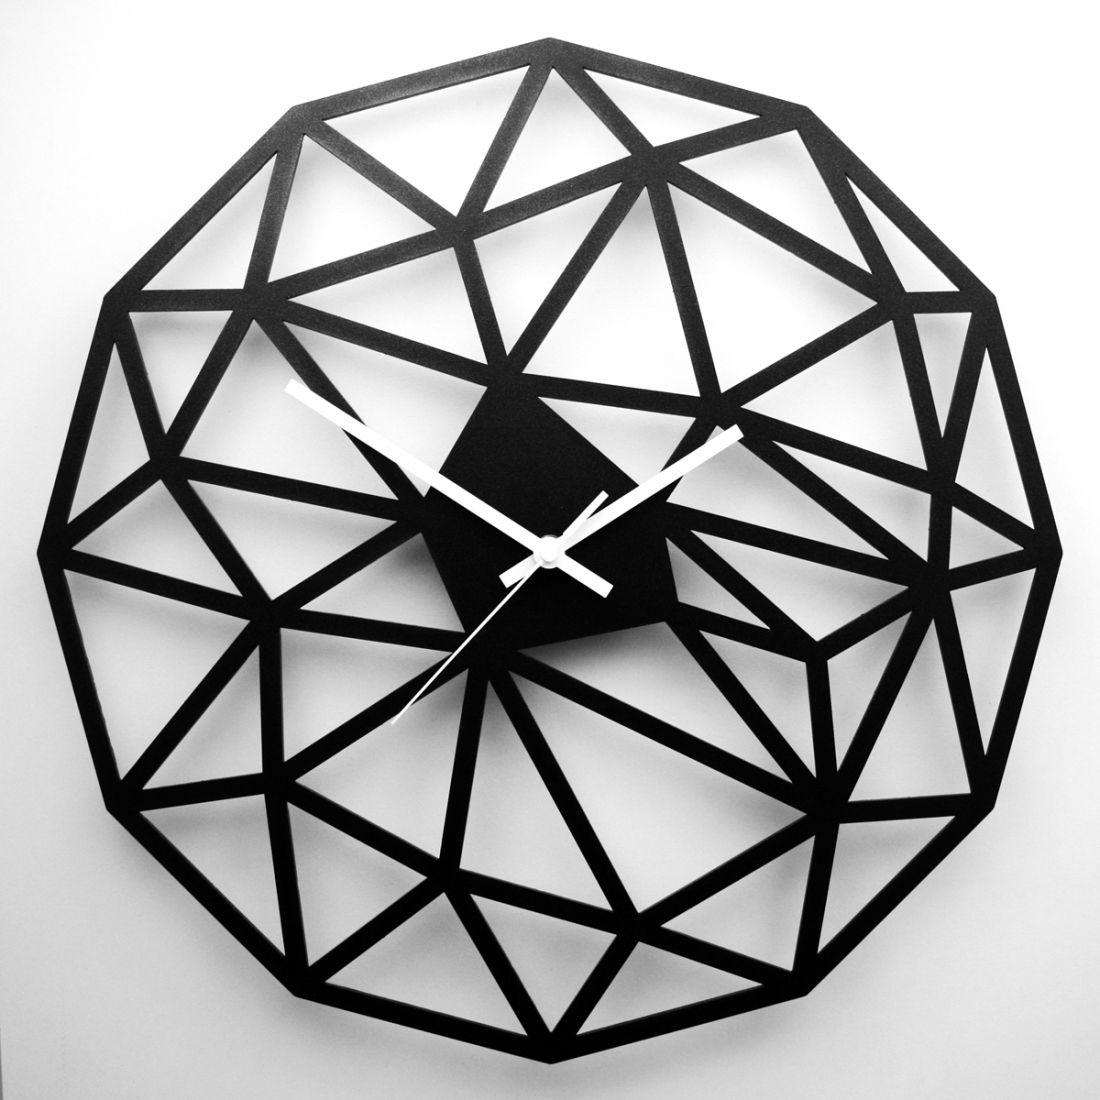 Horloge Platinium Polygon Design Horloges Design Wall Design